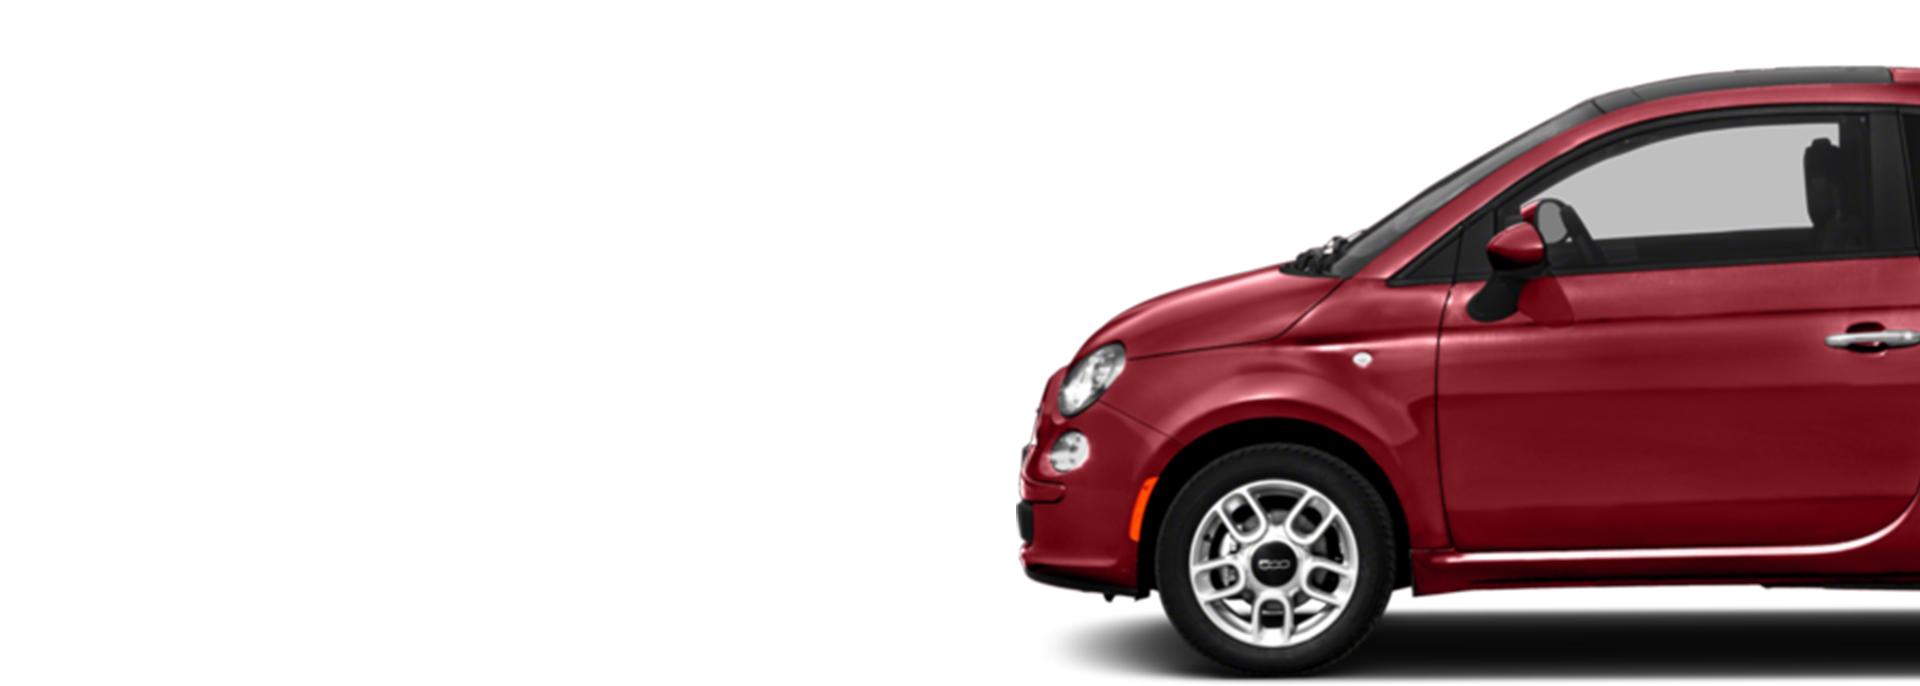 Fiat-500-homepage-Left